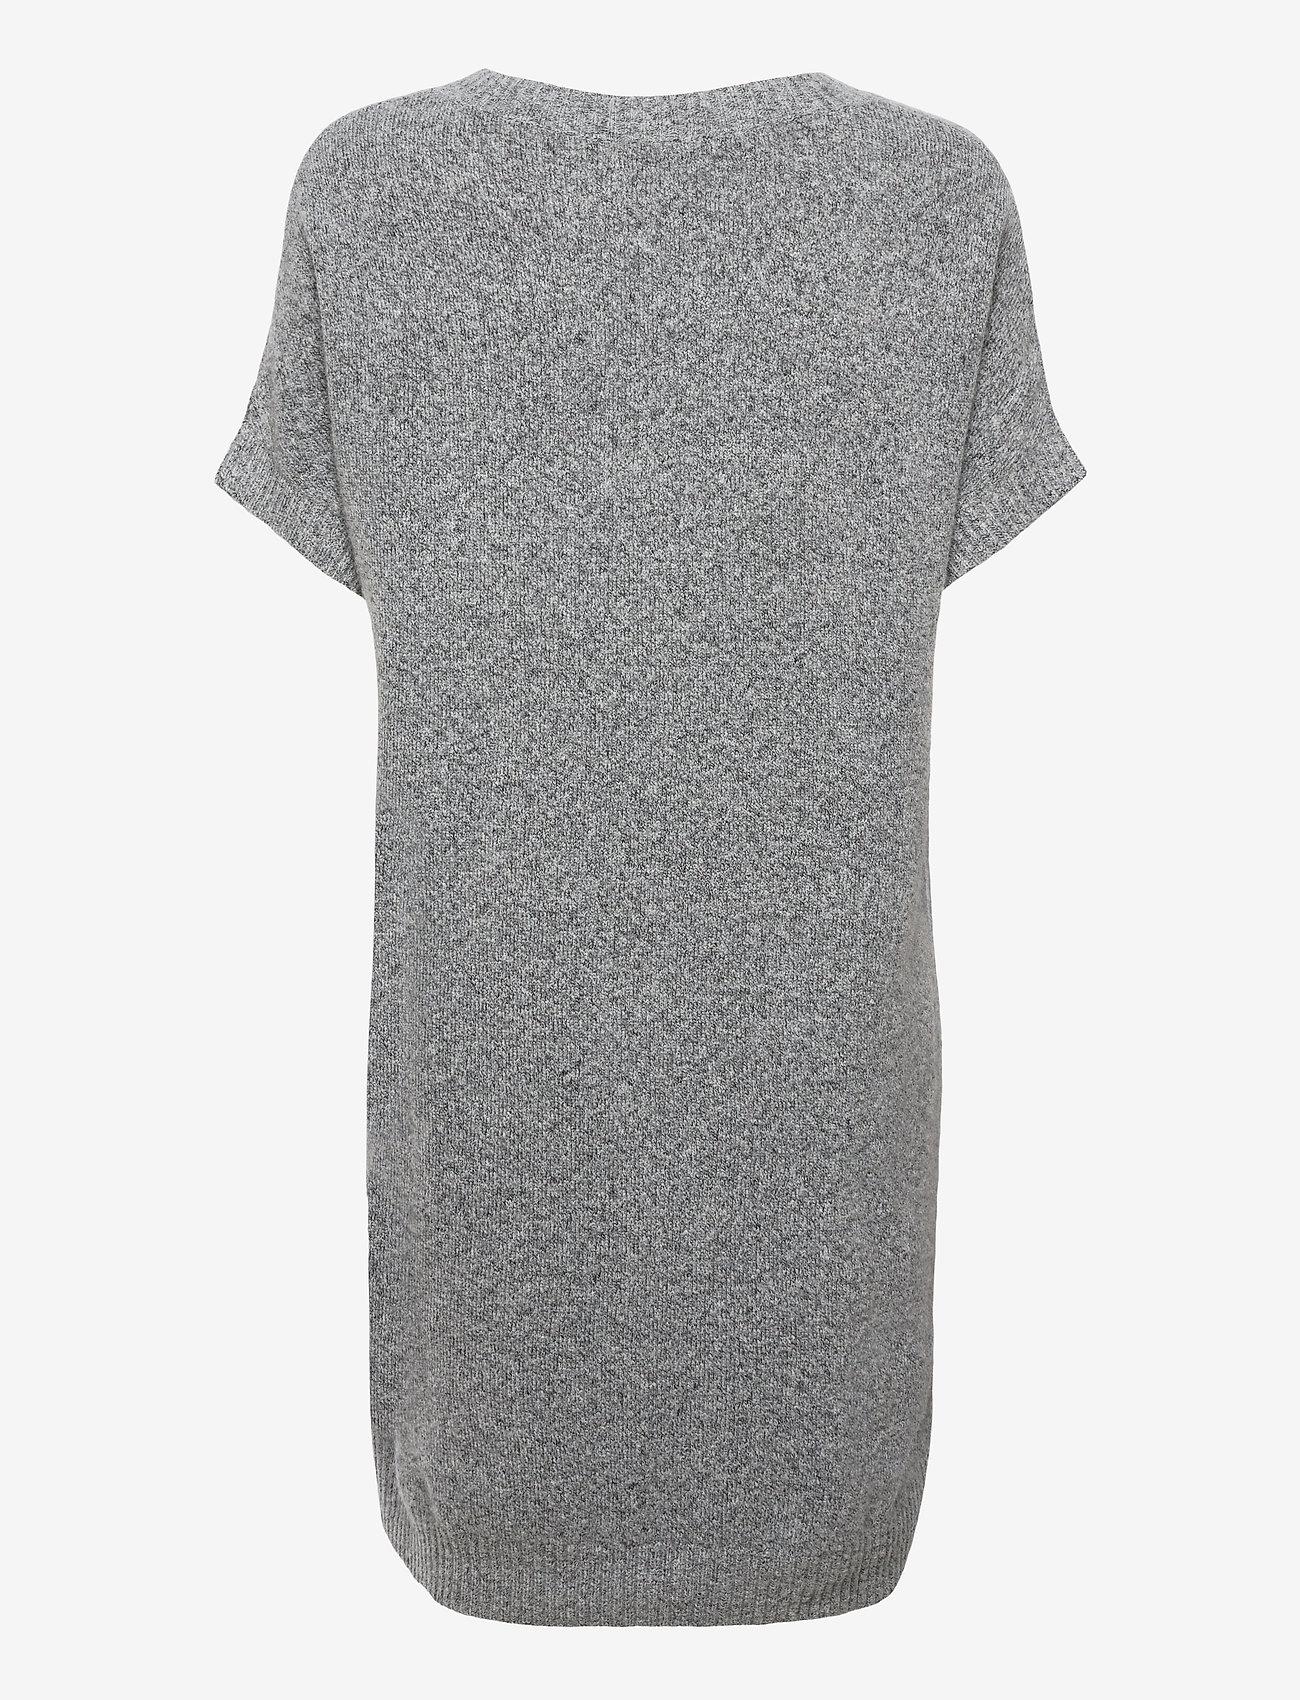 SAND - 5210 - Izadi Dress - robes de jour - grey - 1